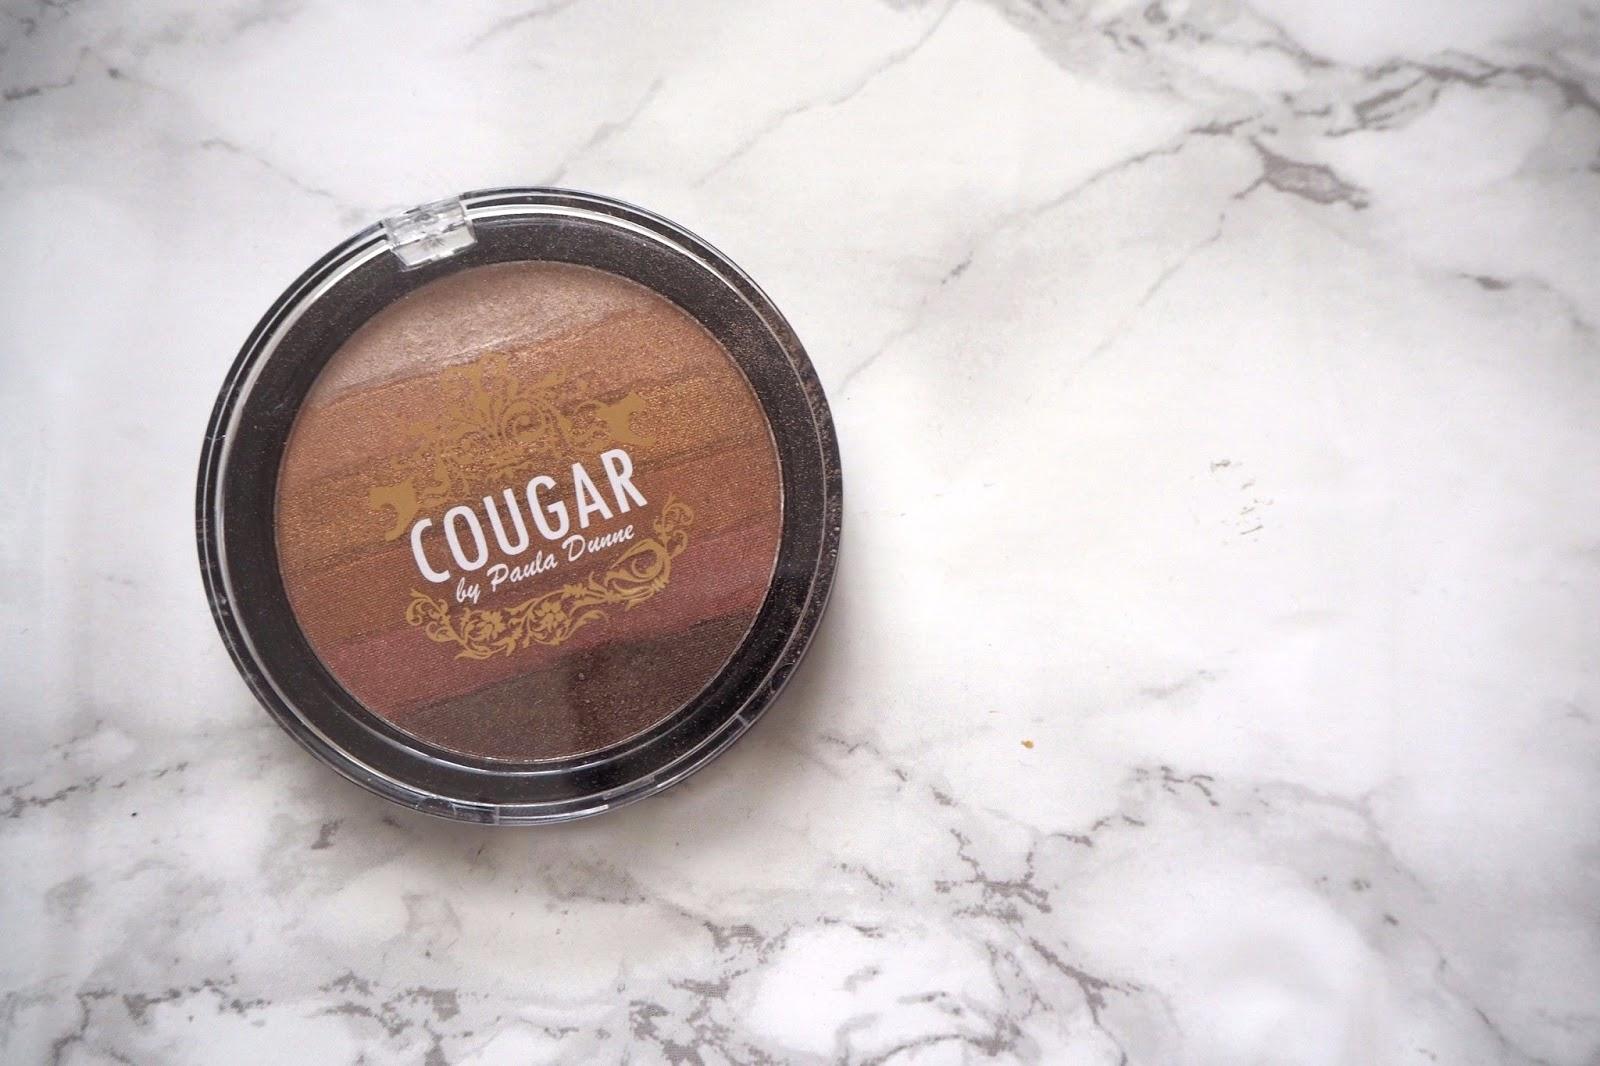 Cougar Makeup Packaging